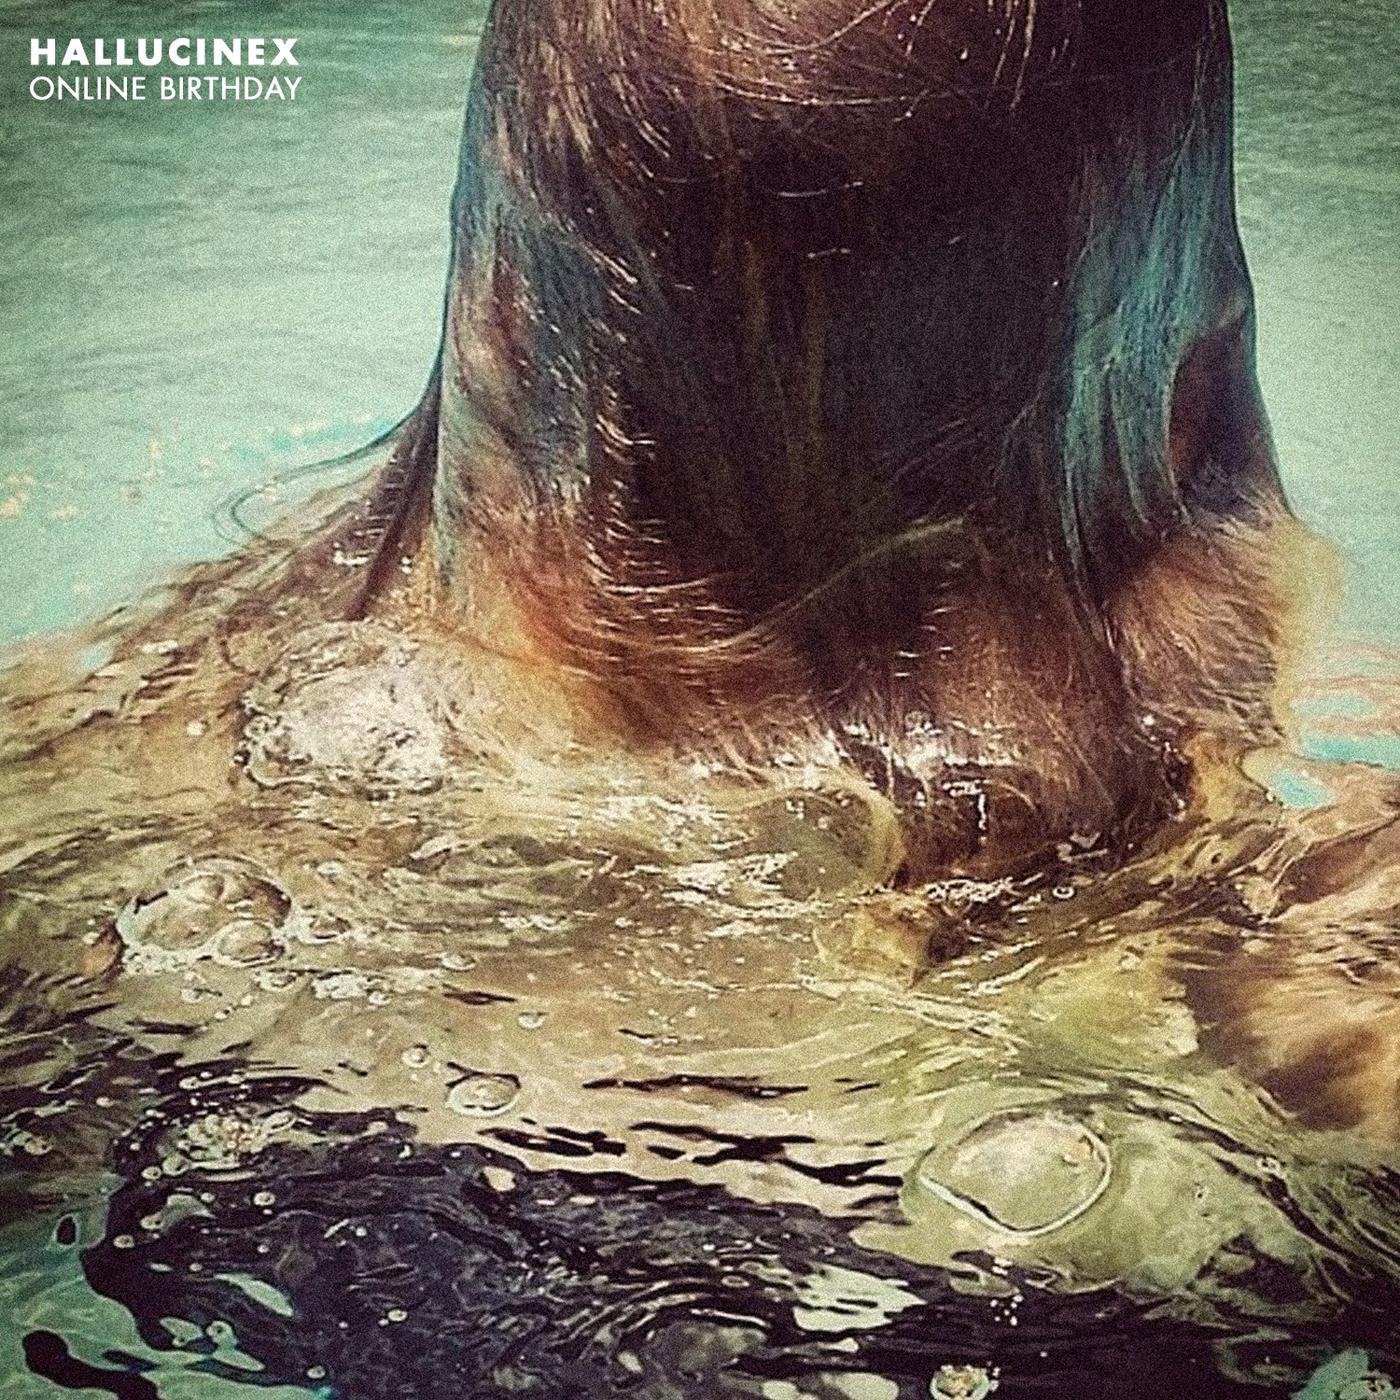 FH017 Hallucinex Cover_1400.jpg